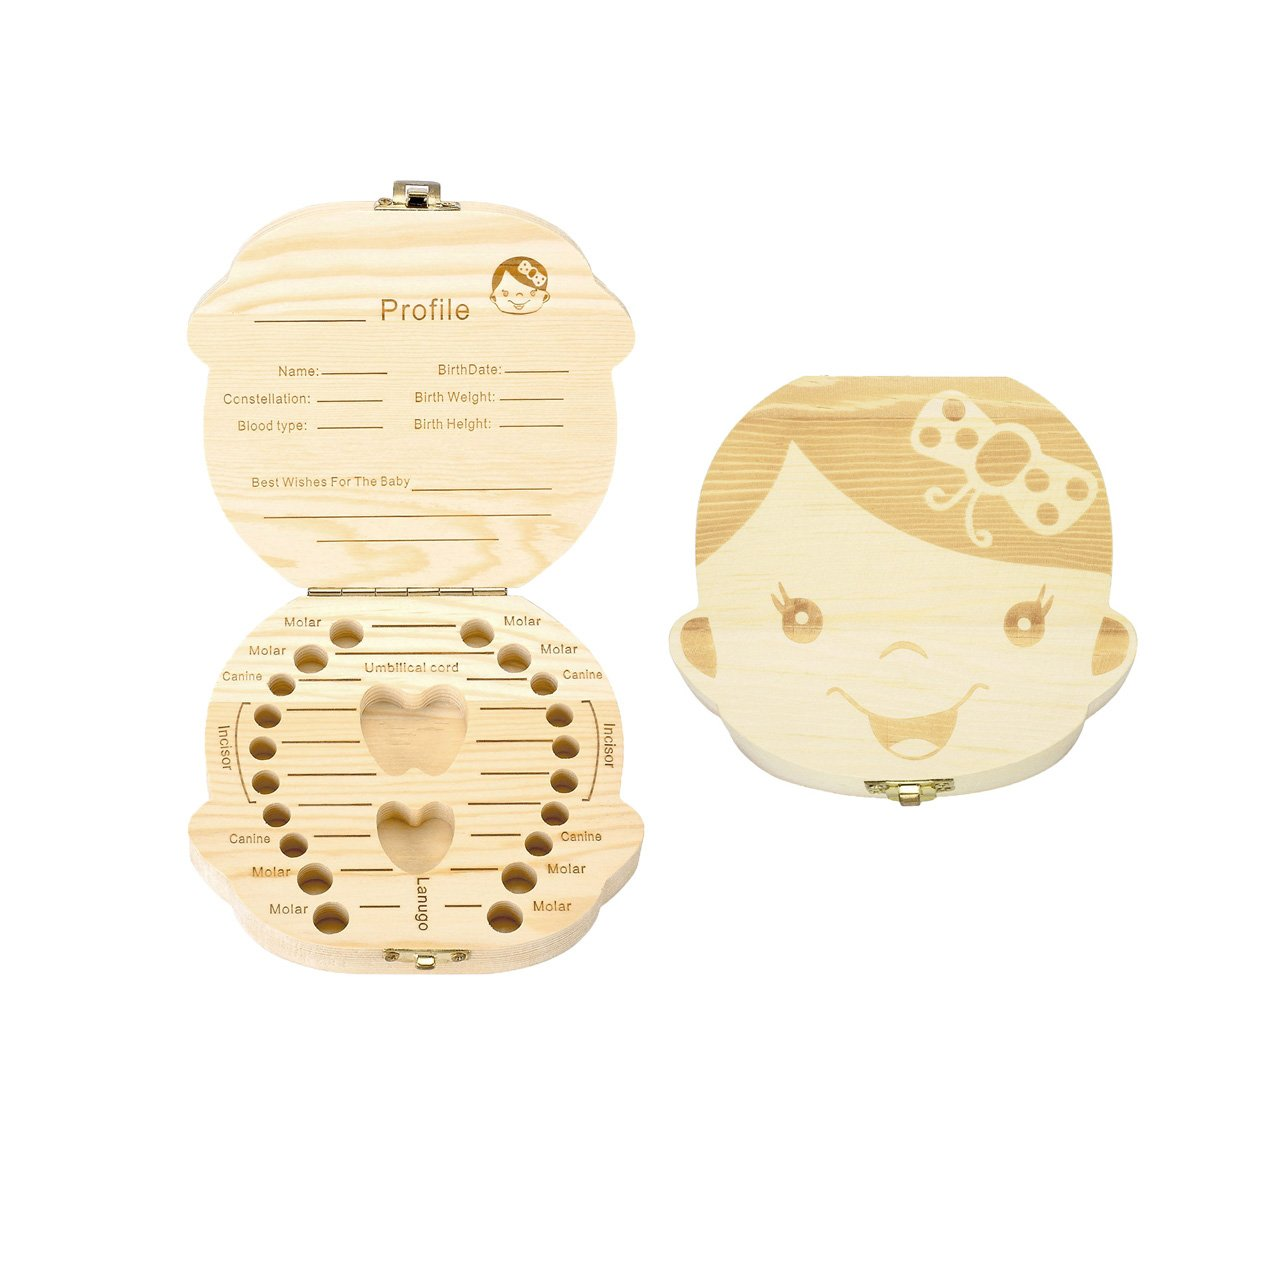 Mogoko Baby Teeth Storage Box and Footprint Picture Frame Kit Wooden Souvenir Bundle Set for Baby Girl by Mogoko (Image #3)